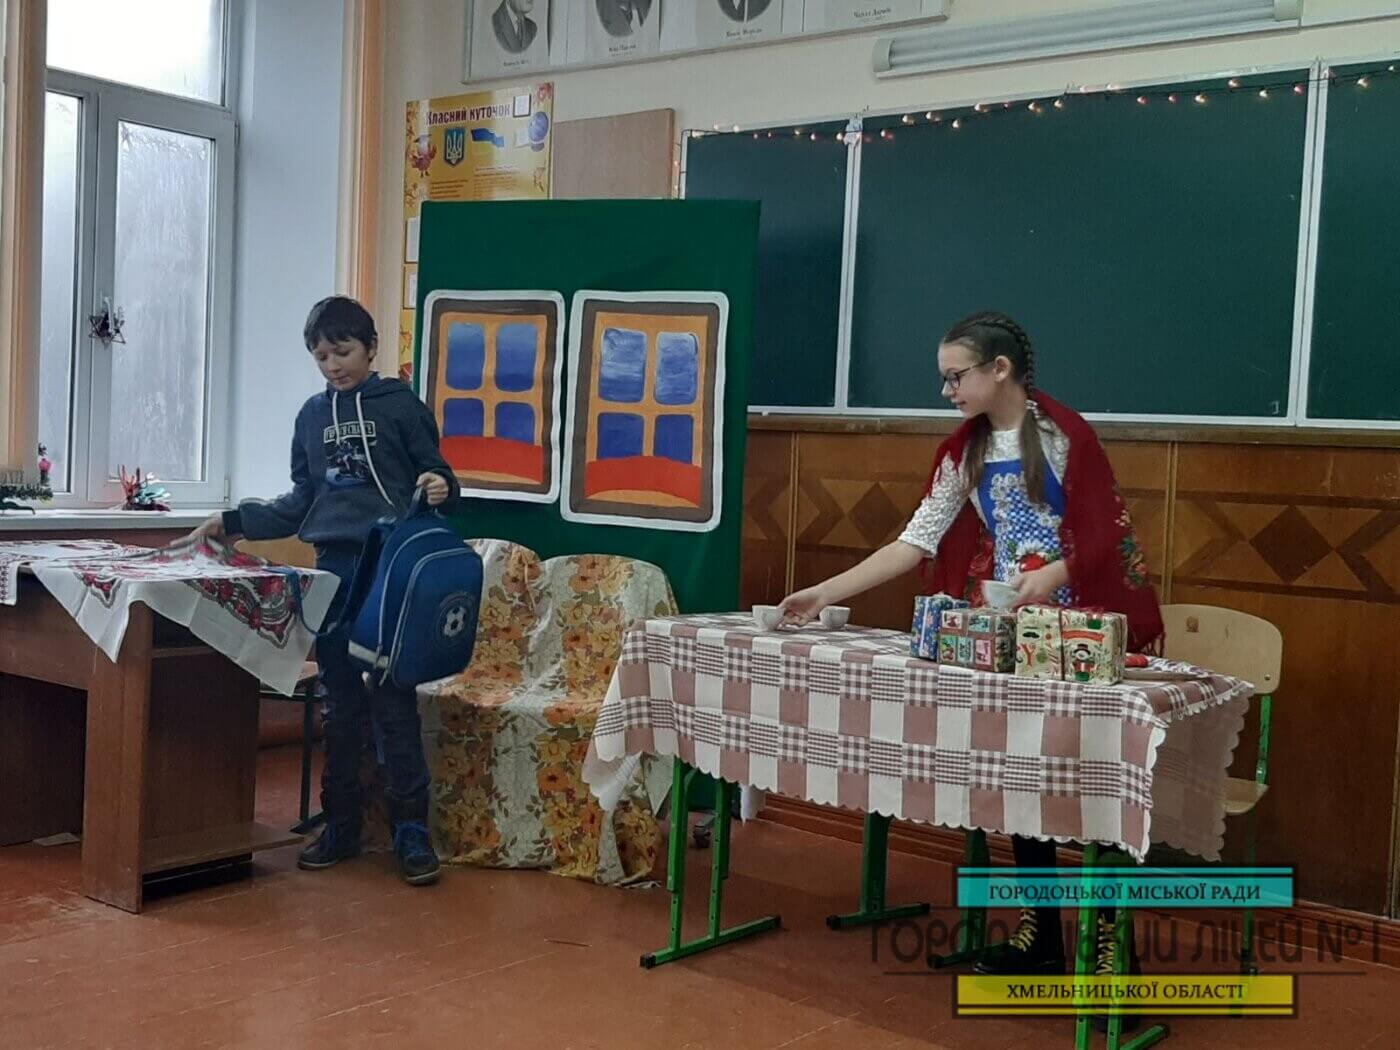 zobrazhennya viber 2020 12 28 21 43 30 1400x1050 - Театральний гурток «Сяйво»